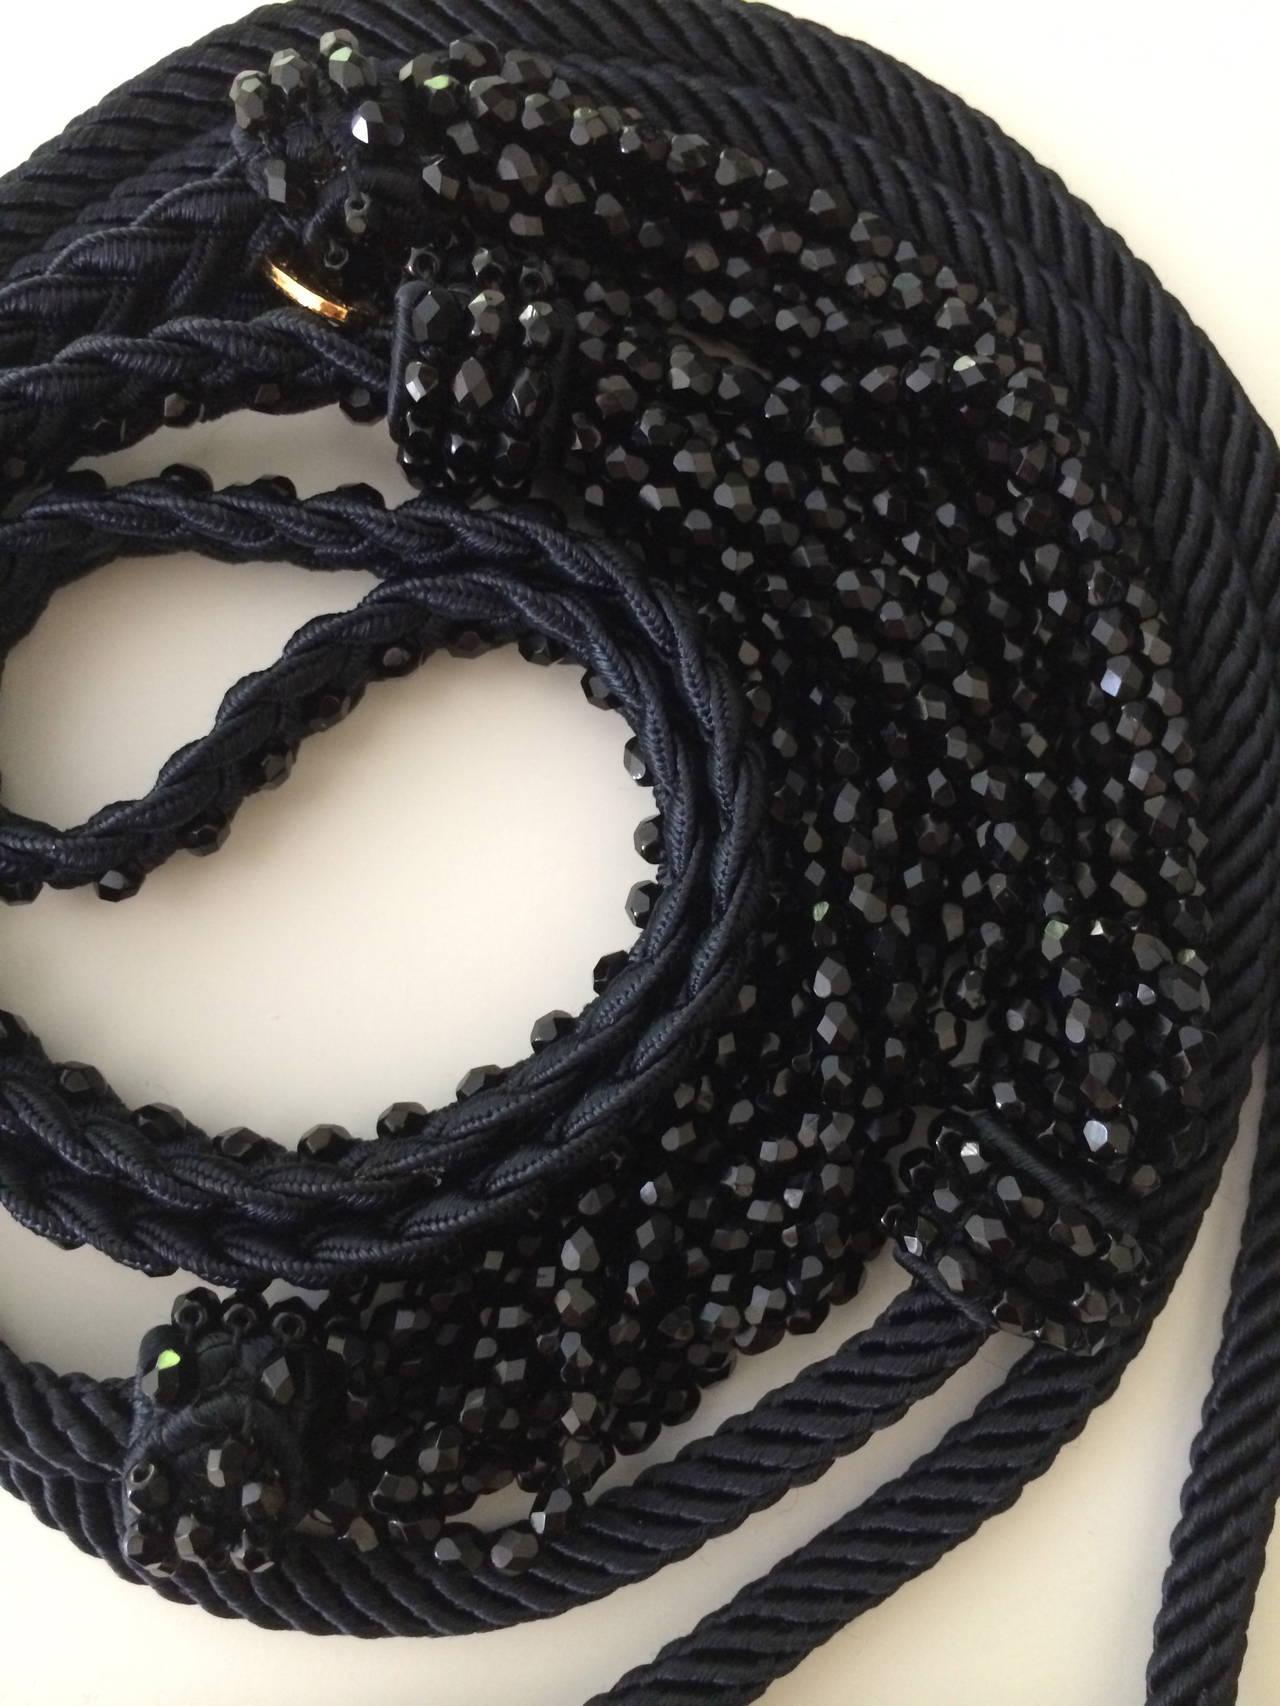 Women's 1990s Yves Saint Laurent Black Beaded Rope & Tassel Necklace Belt YSL Vintage  For Sale